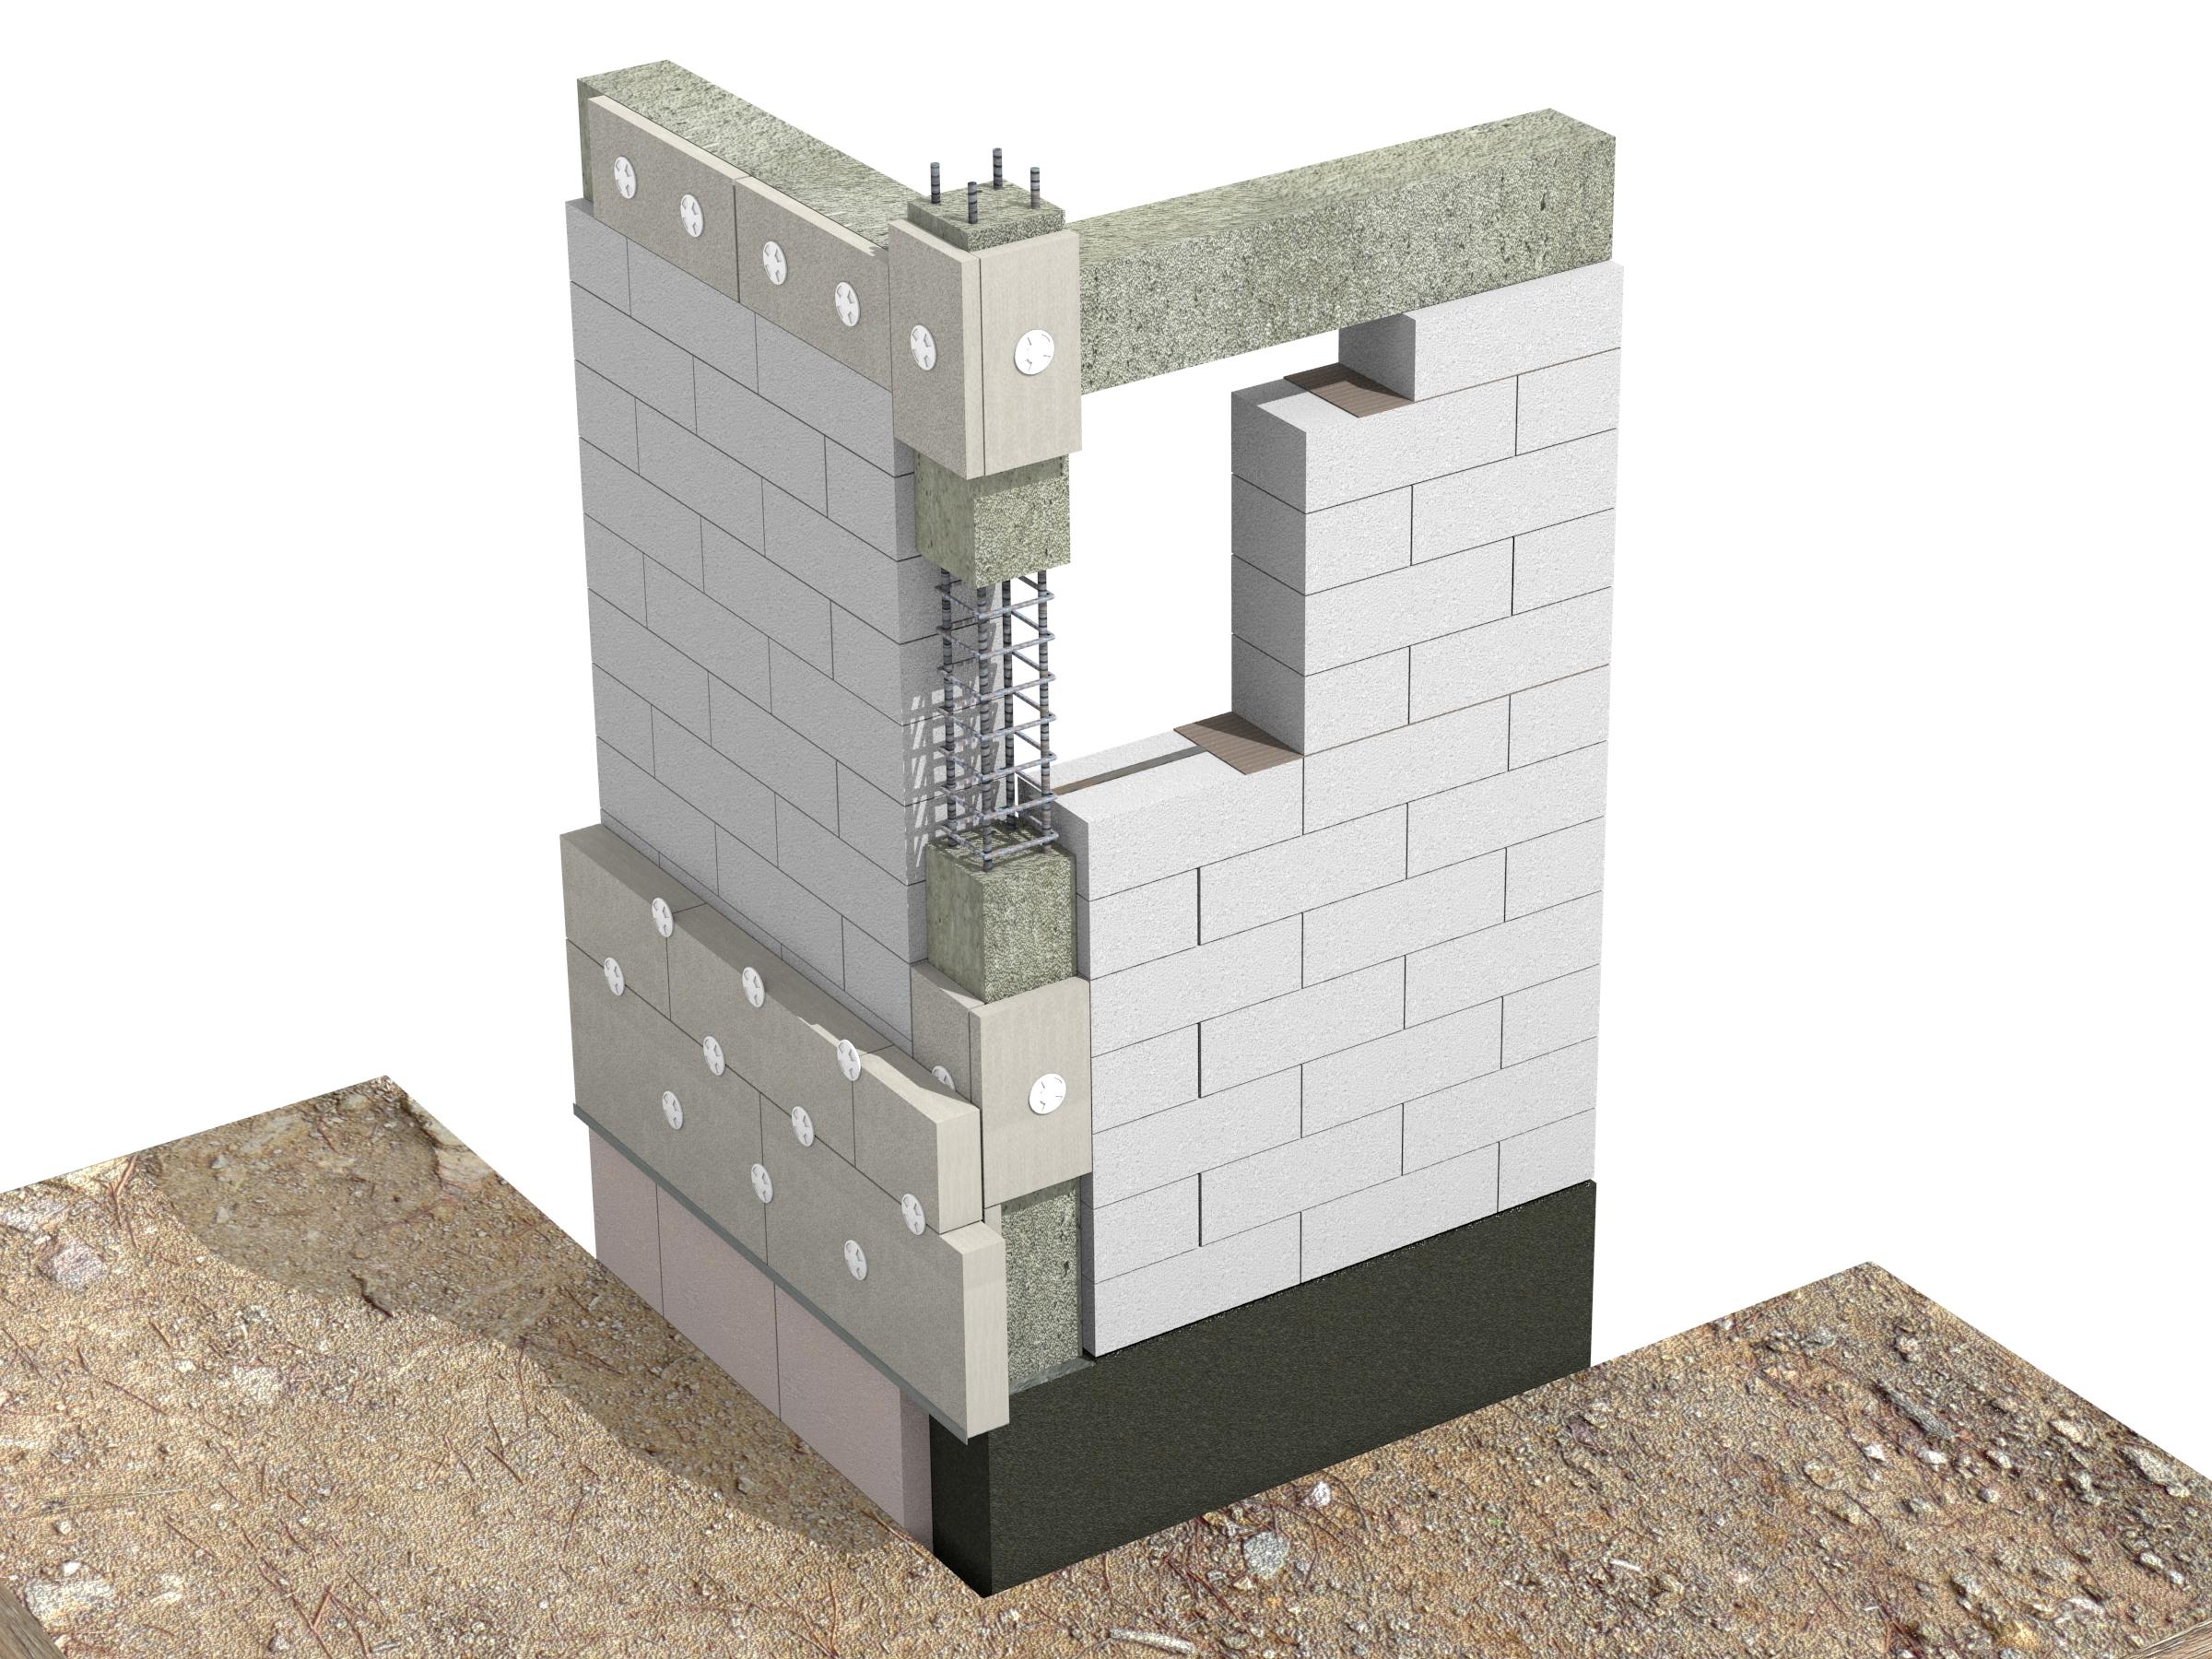 Racord de colt zidarie portanta - atenuare punti termice in cazul zidariei multistrat - Racordul cu